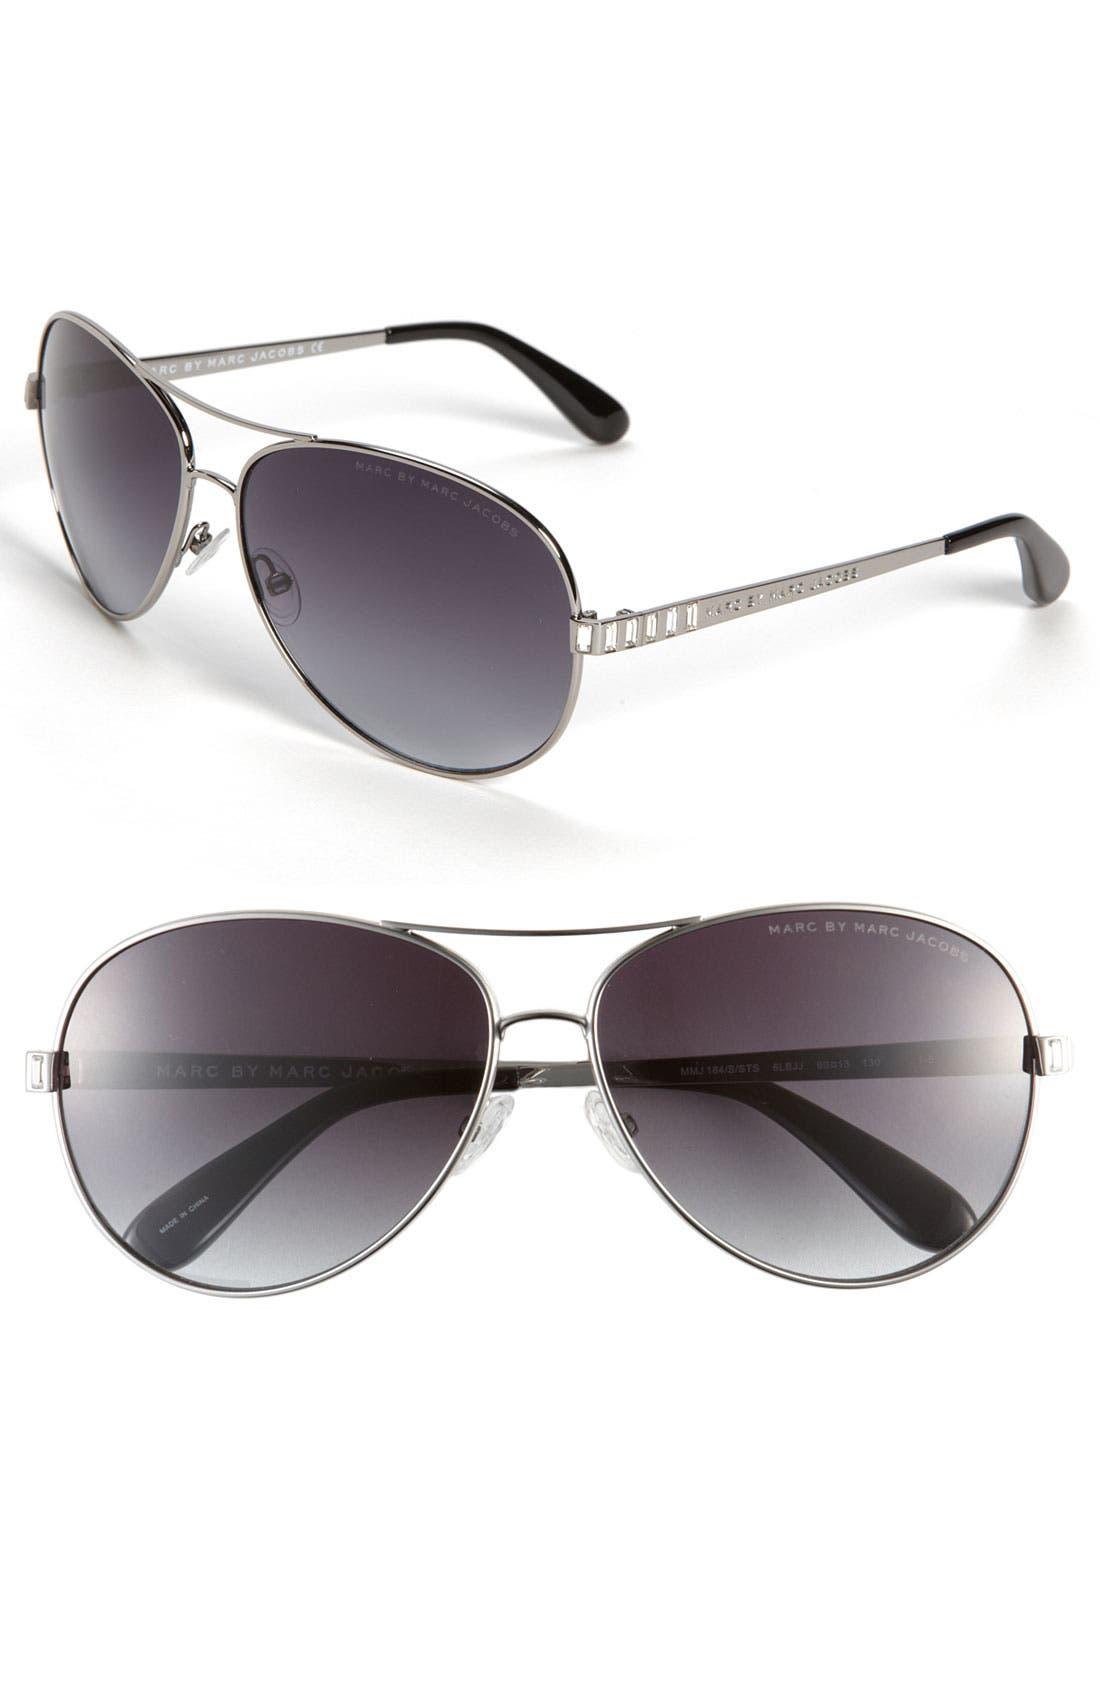 60mm Aviator Sunglasses,                         Main,                         color, 020